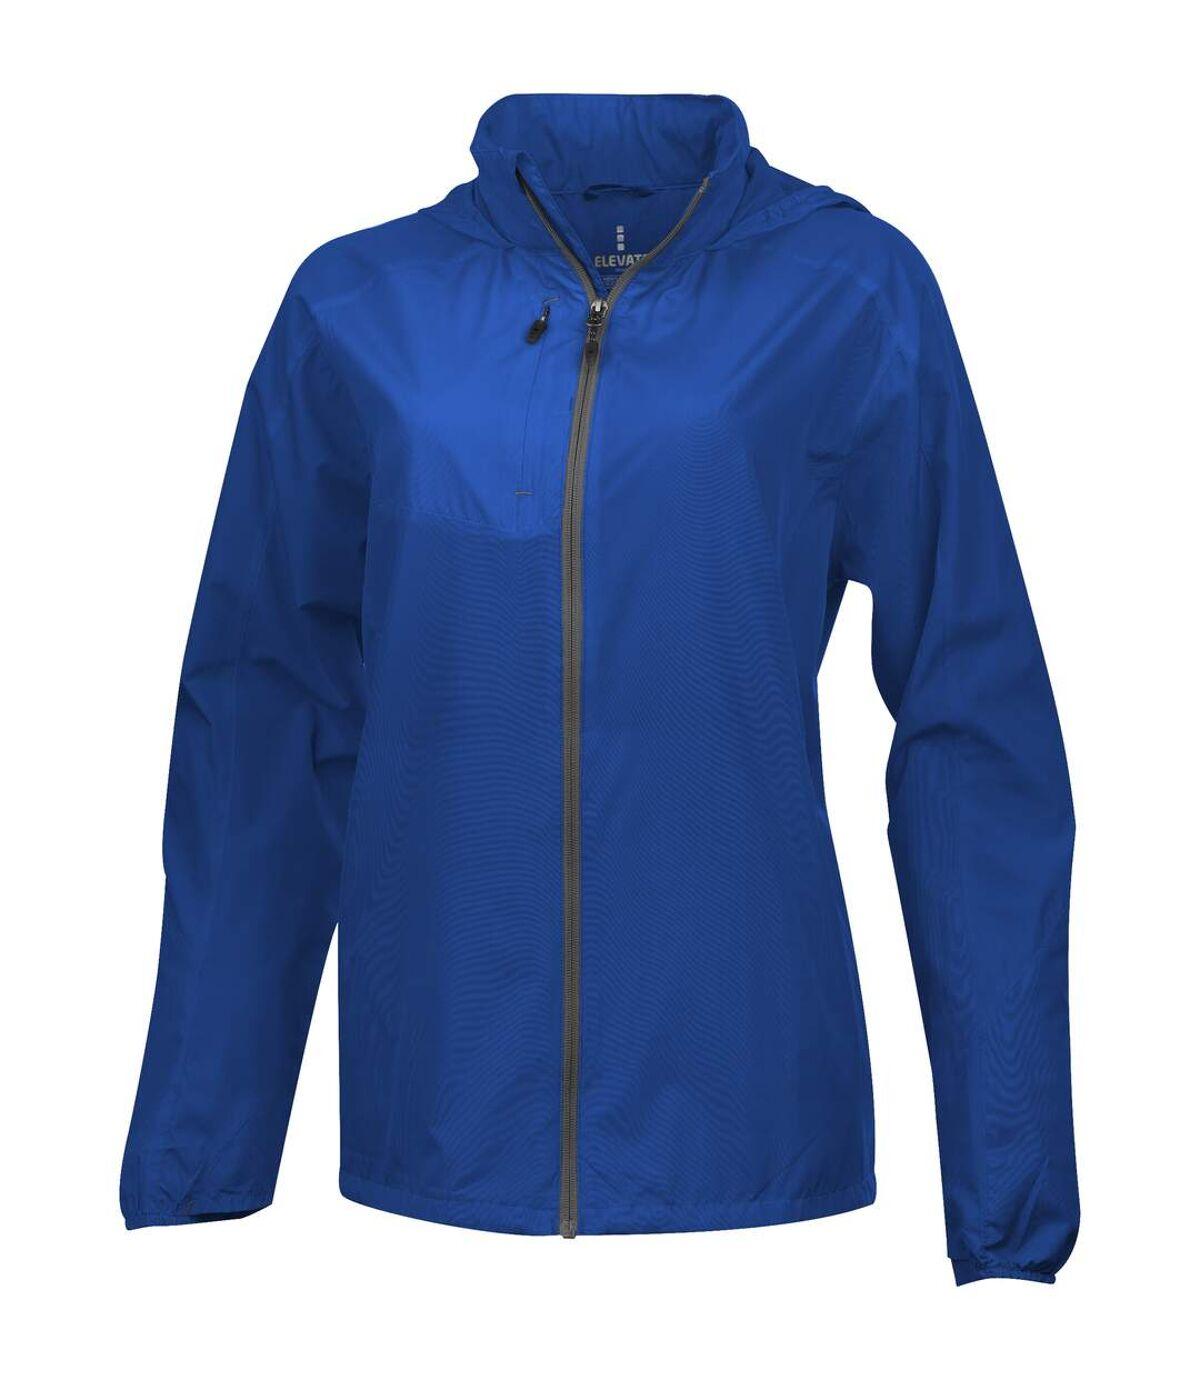 Elevate Mens Flint Lightweight Jacket (Blue) - UTPF1864